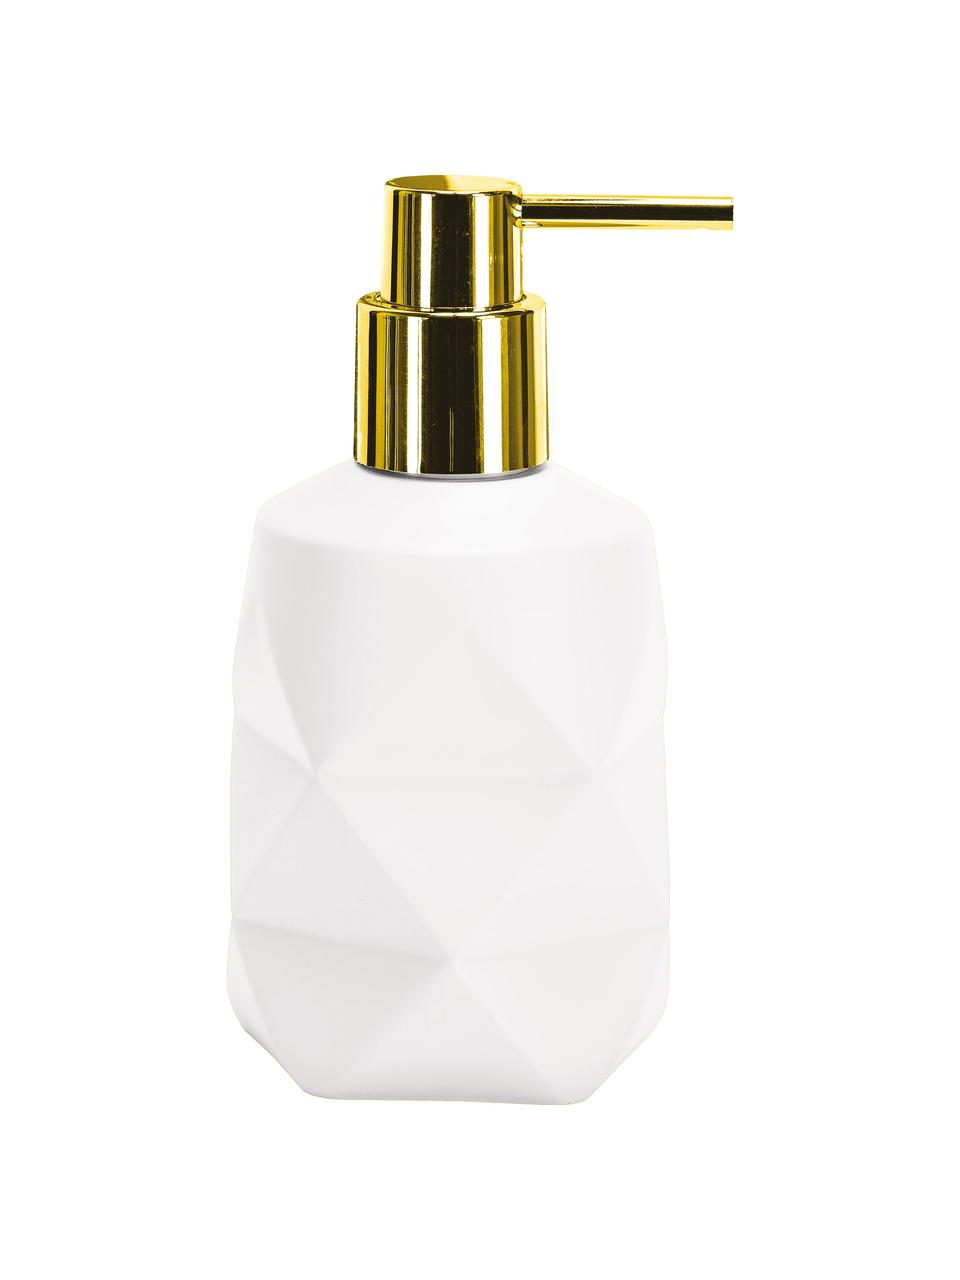 Seifenspender Crackle aus bruchfestem Polyresin, Pumpkopf: Metall, Weiß, Ø 8 x H 17 cm